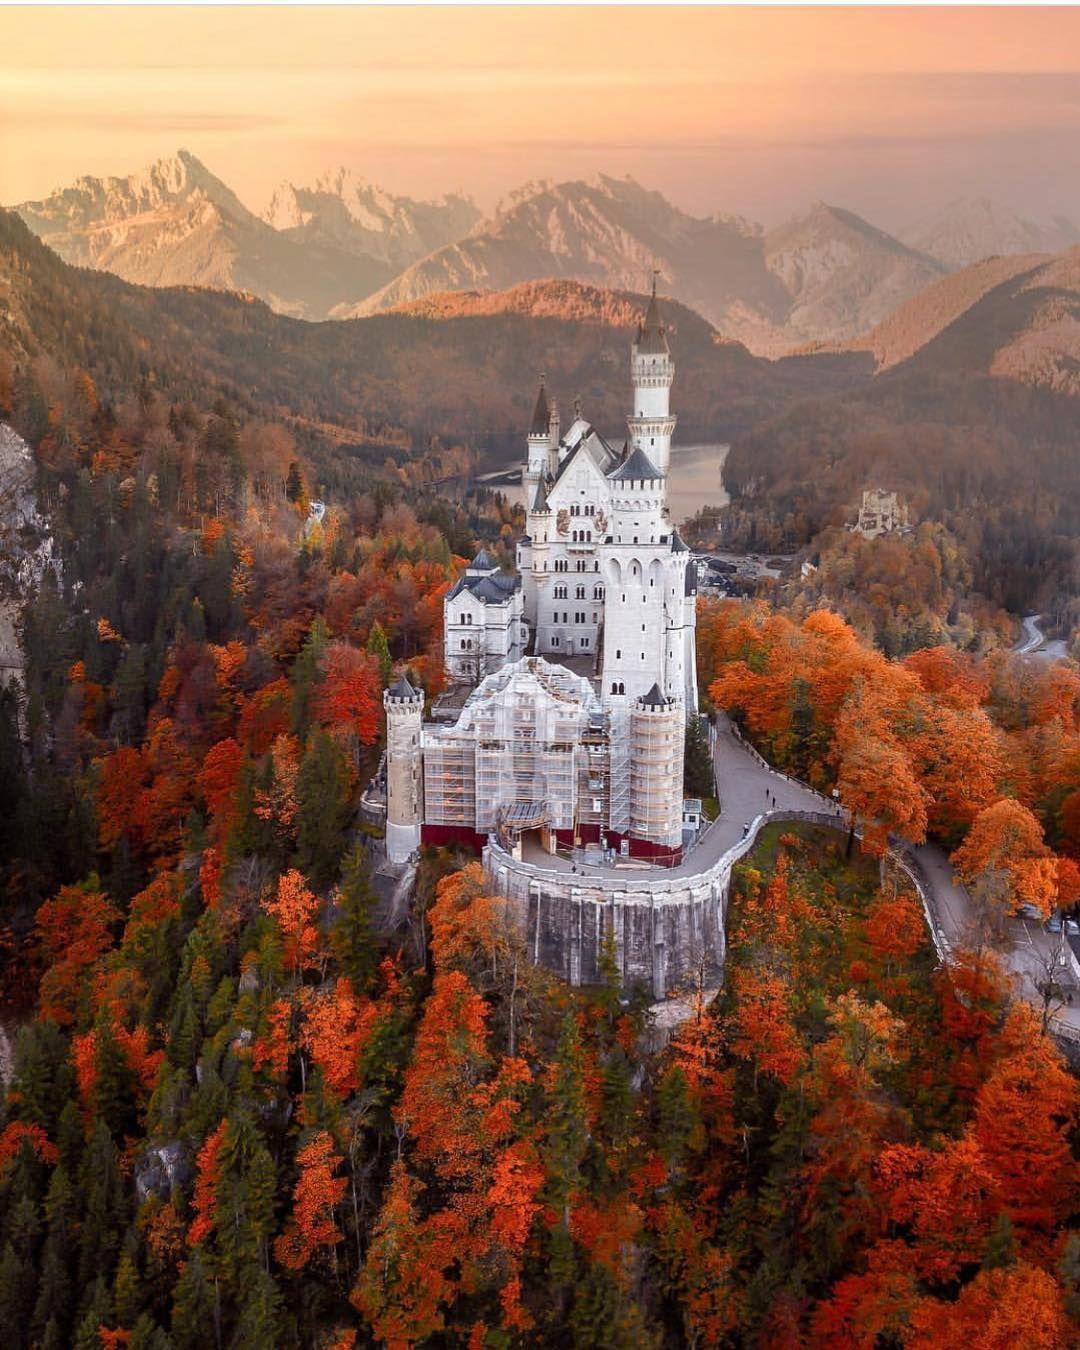 Neuschwanstein Castle Bavaria Germany Credit To Sennarelax Tag Beautifulrawworld To Be Featured Mit Bildern Neuschwanstein Schloss Neuschwanstein